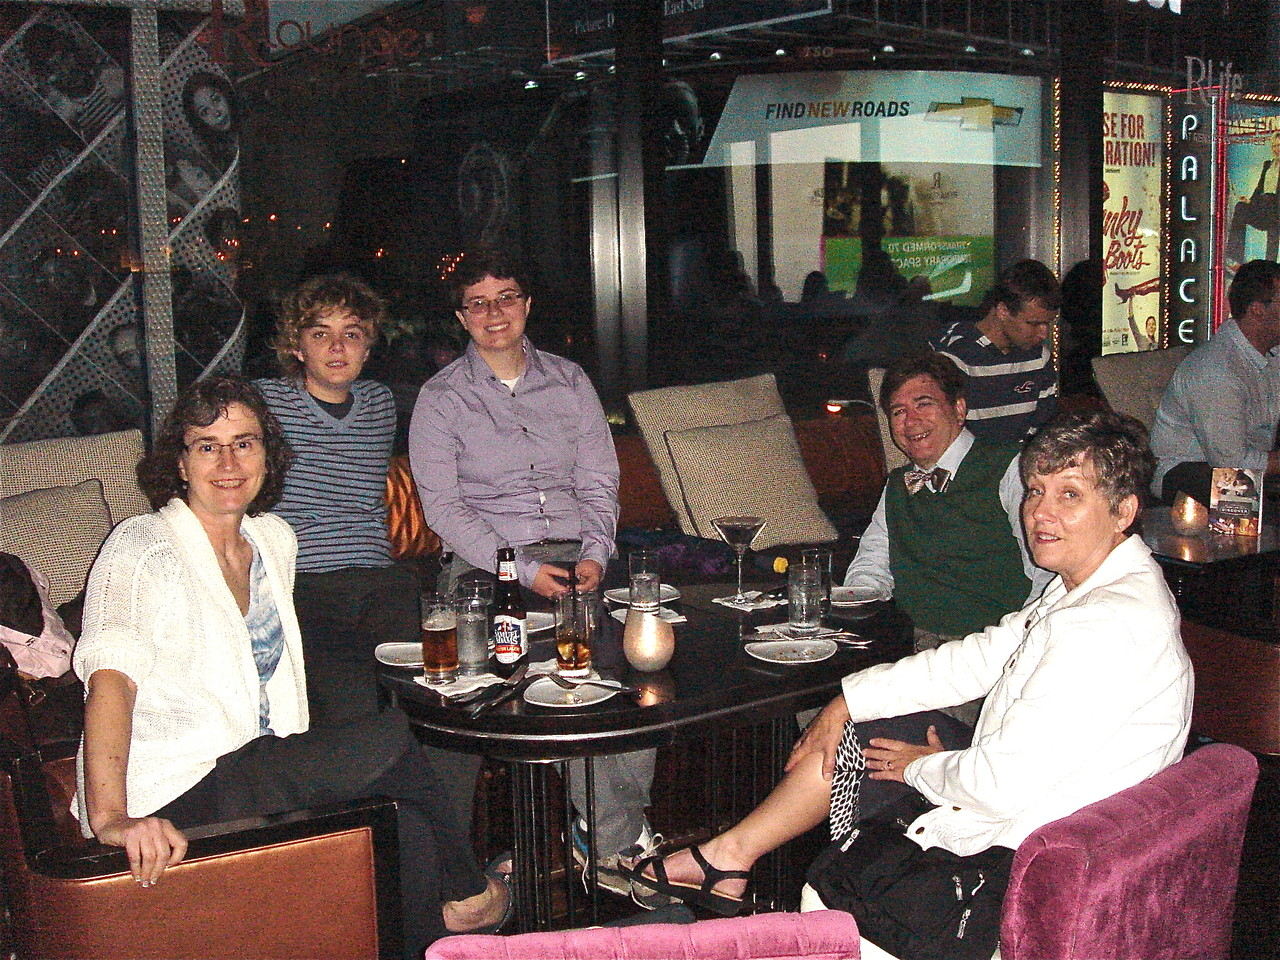 Ann, Kathleen, Emilea, John & Cindy Wagner, Times Square, 6-2013